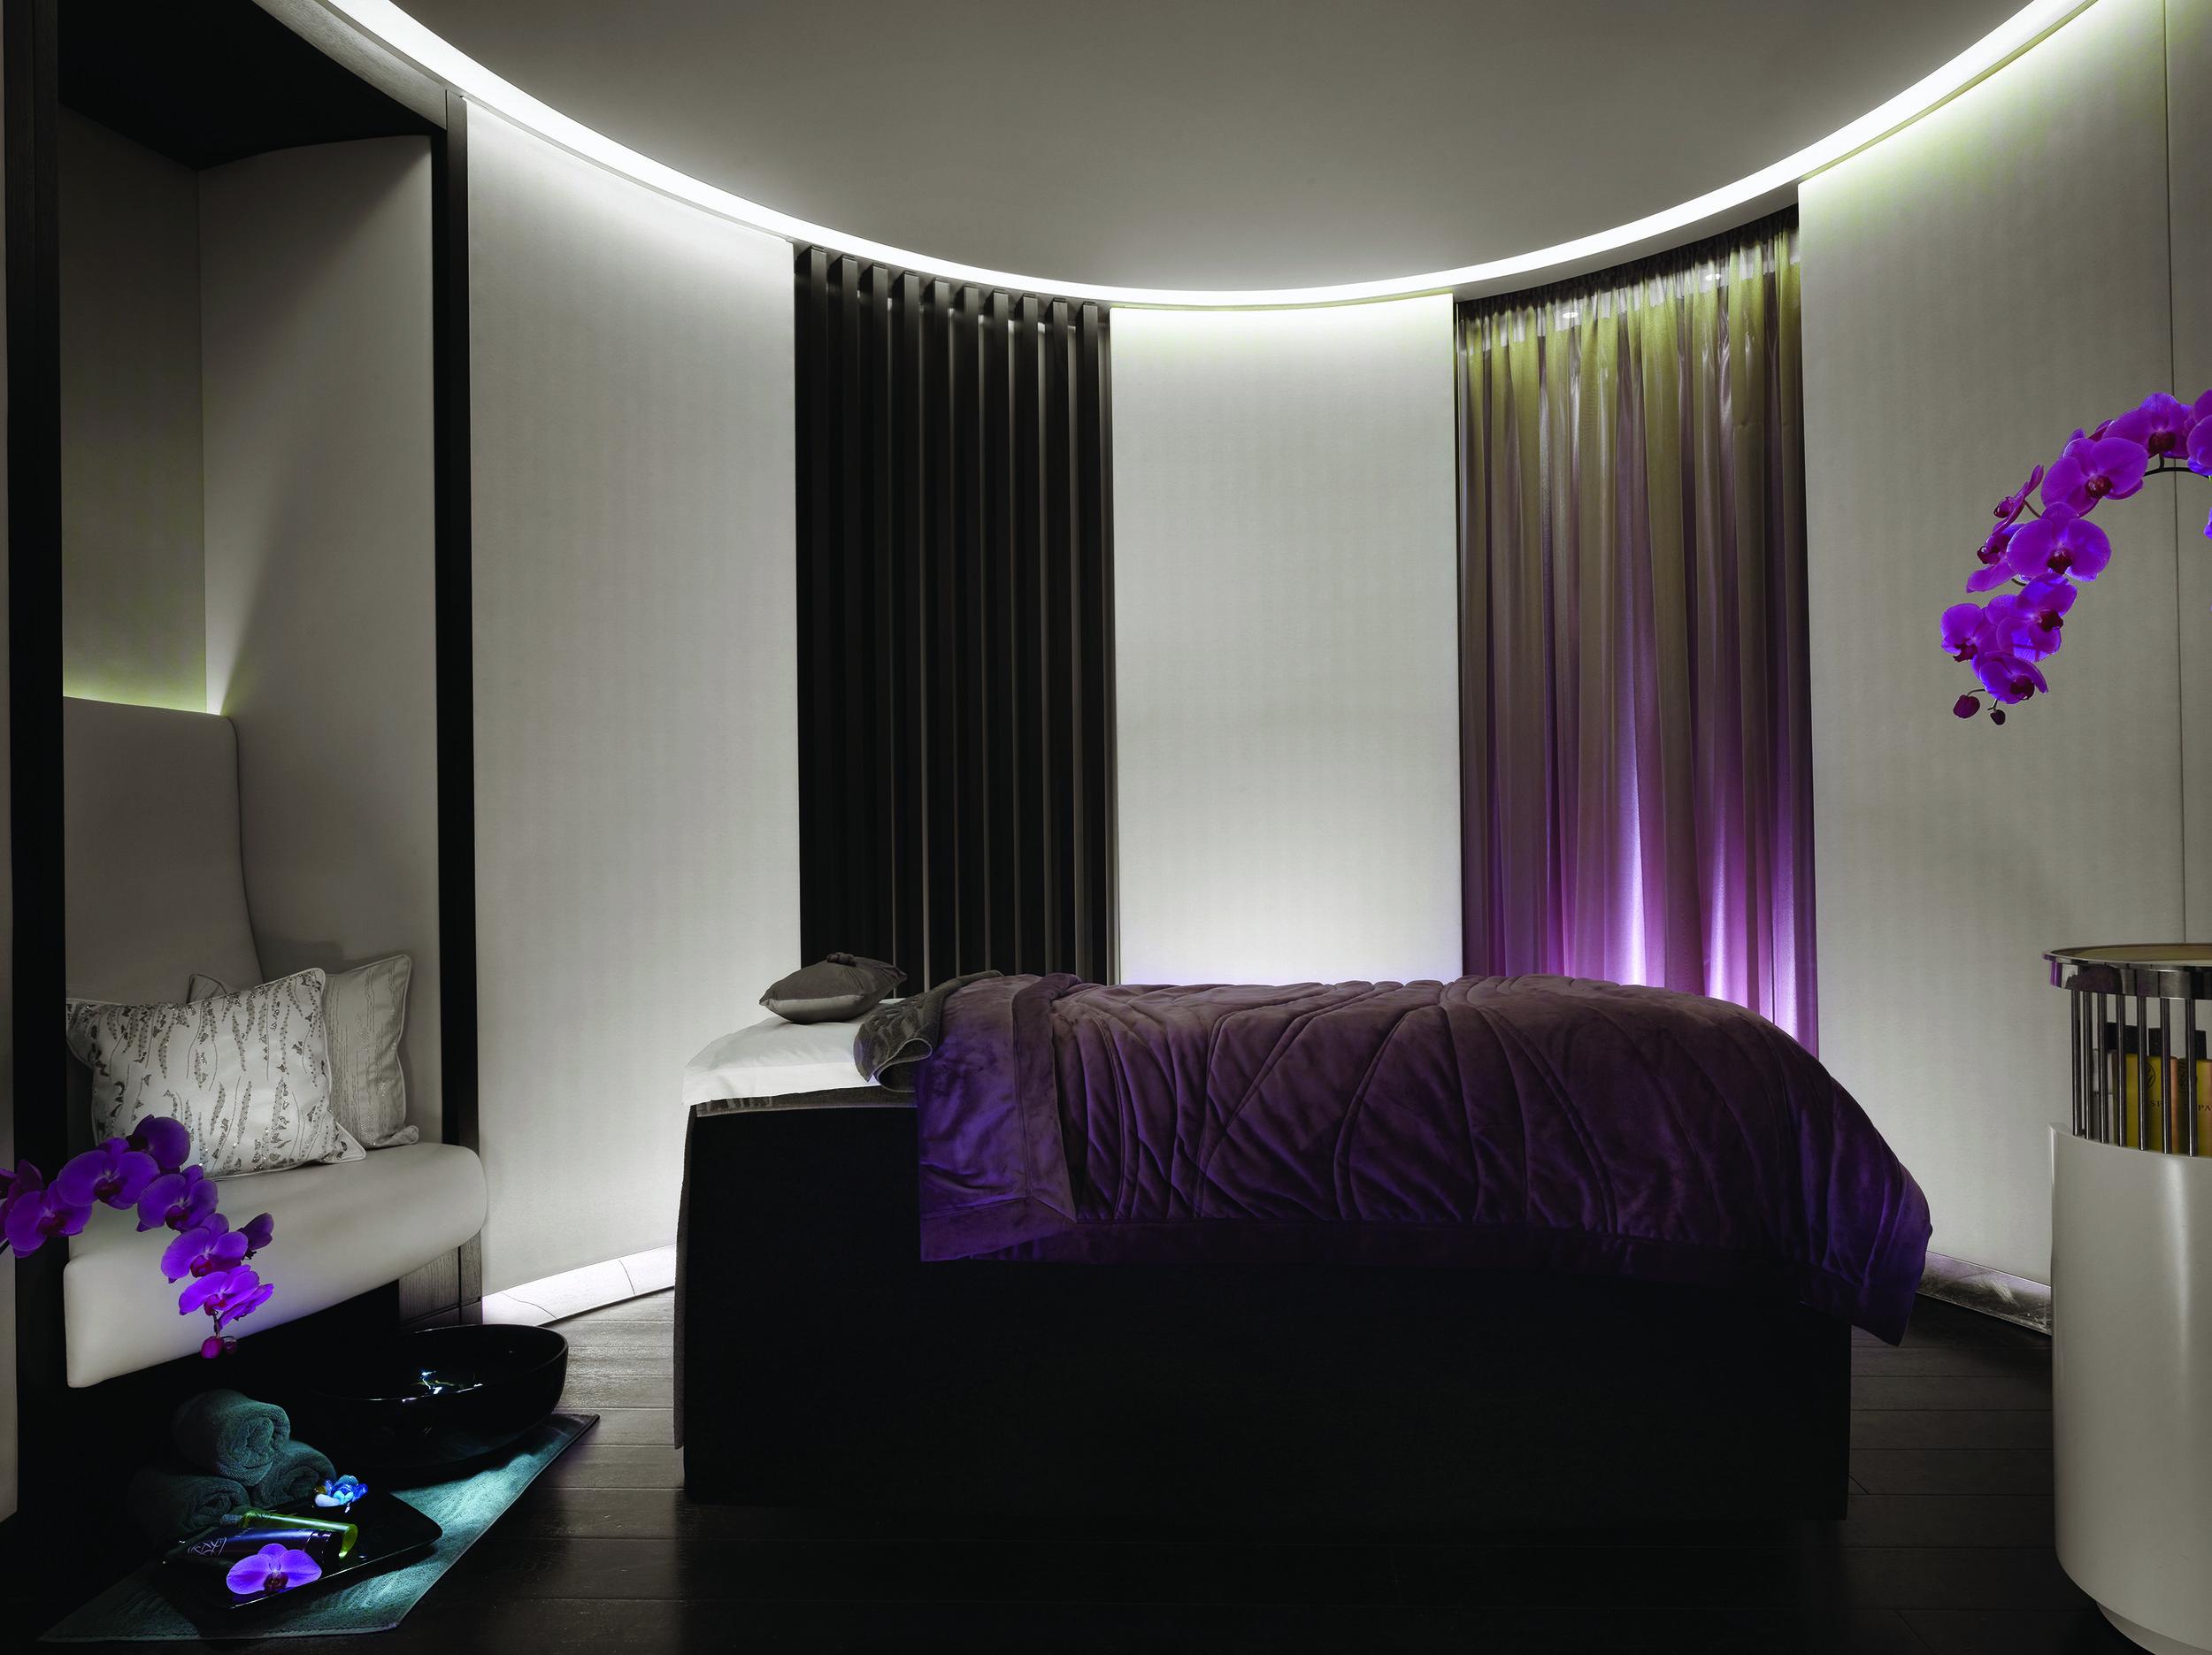 20. ESPA Life at Corinthia - Spa Suite at Corinthia Hotel London.jpg